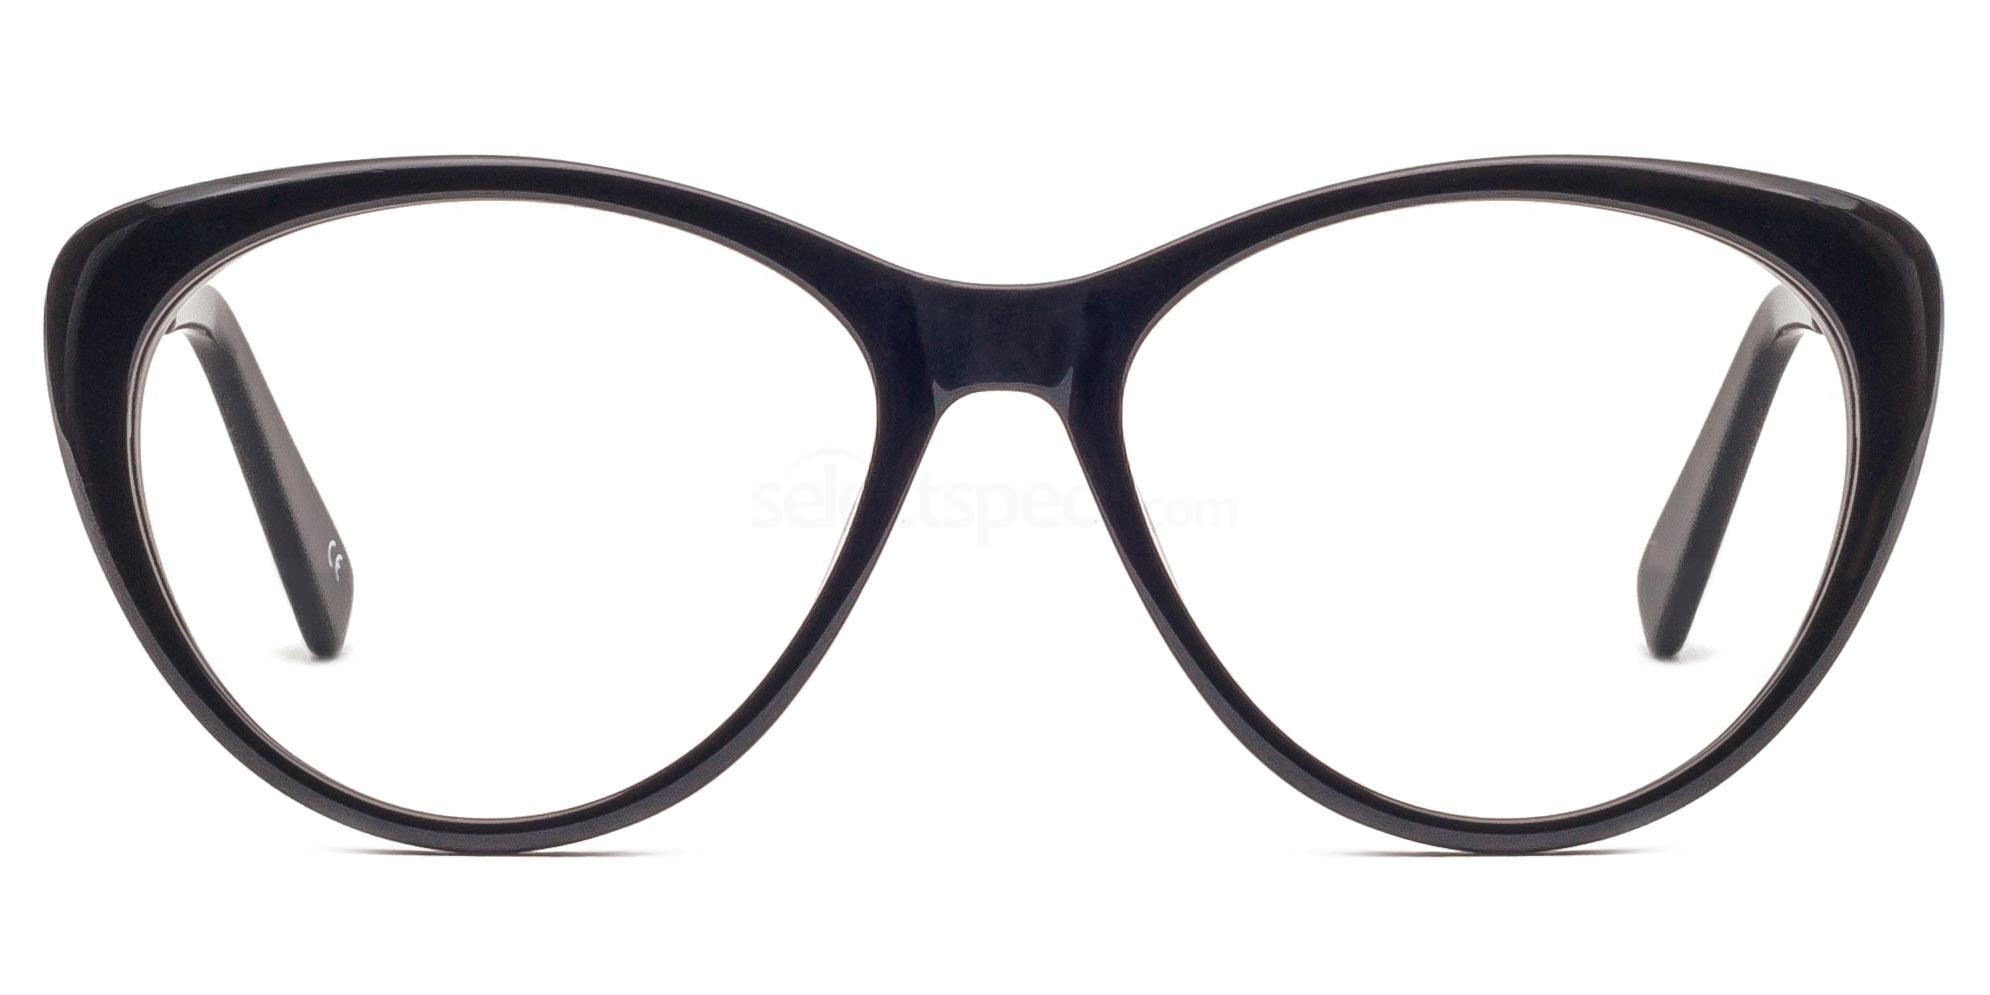 C1 SRA164 Glasses, Infinity